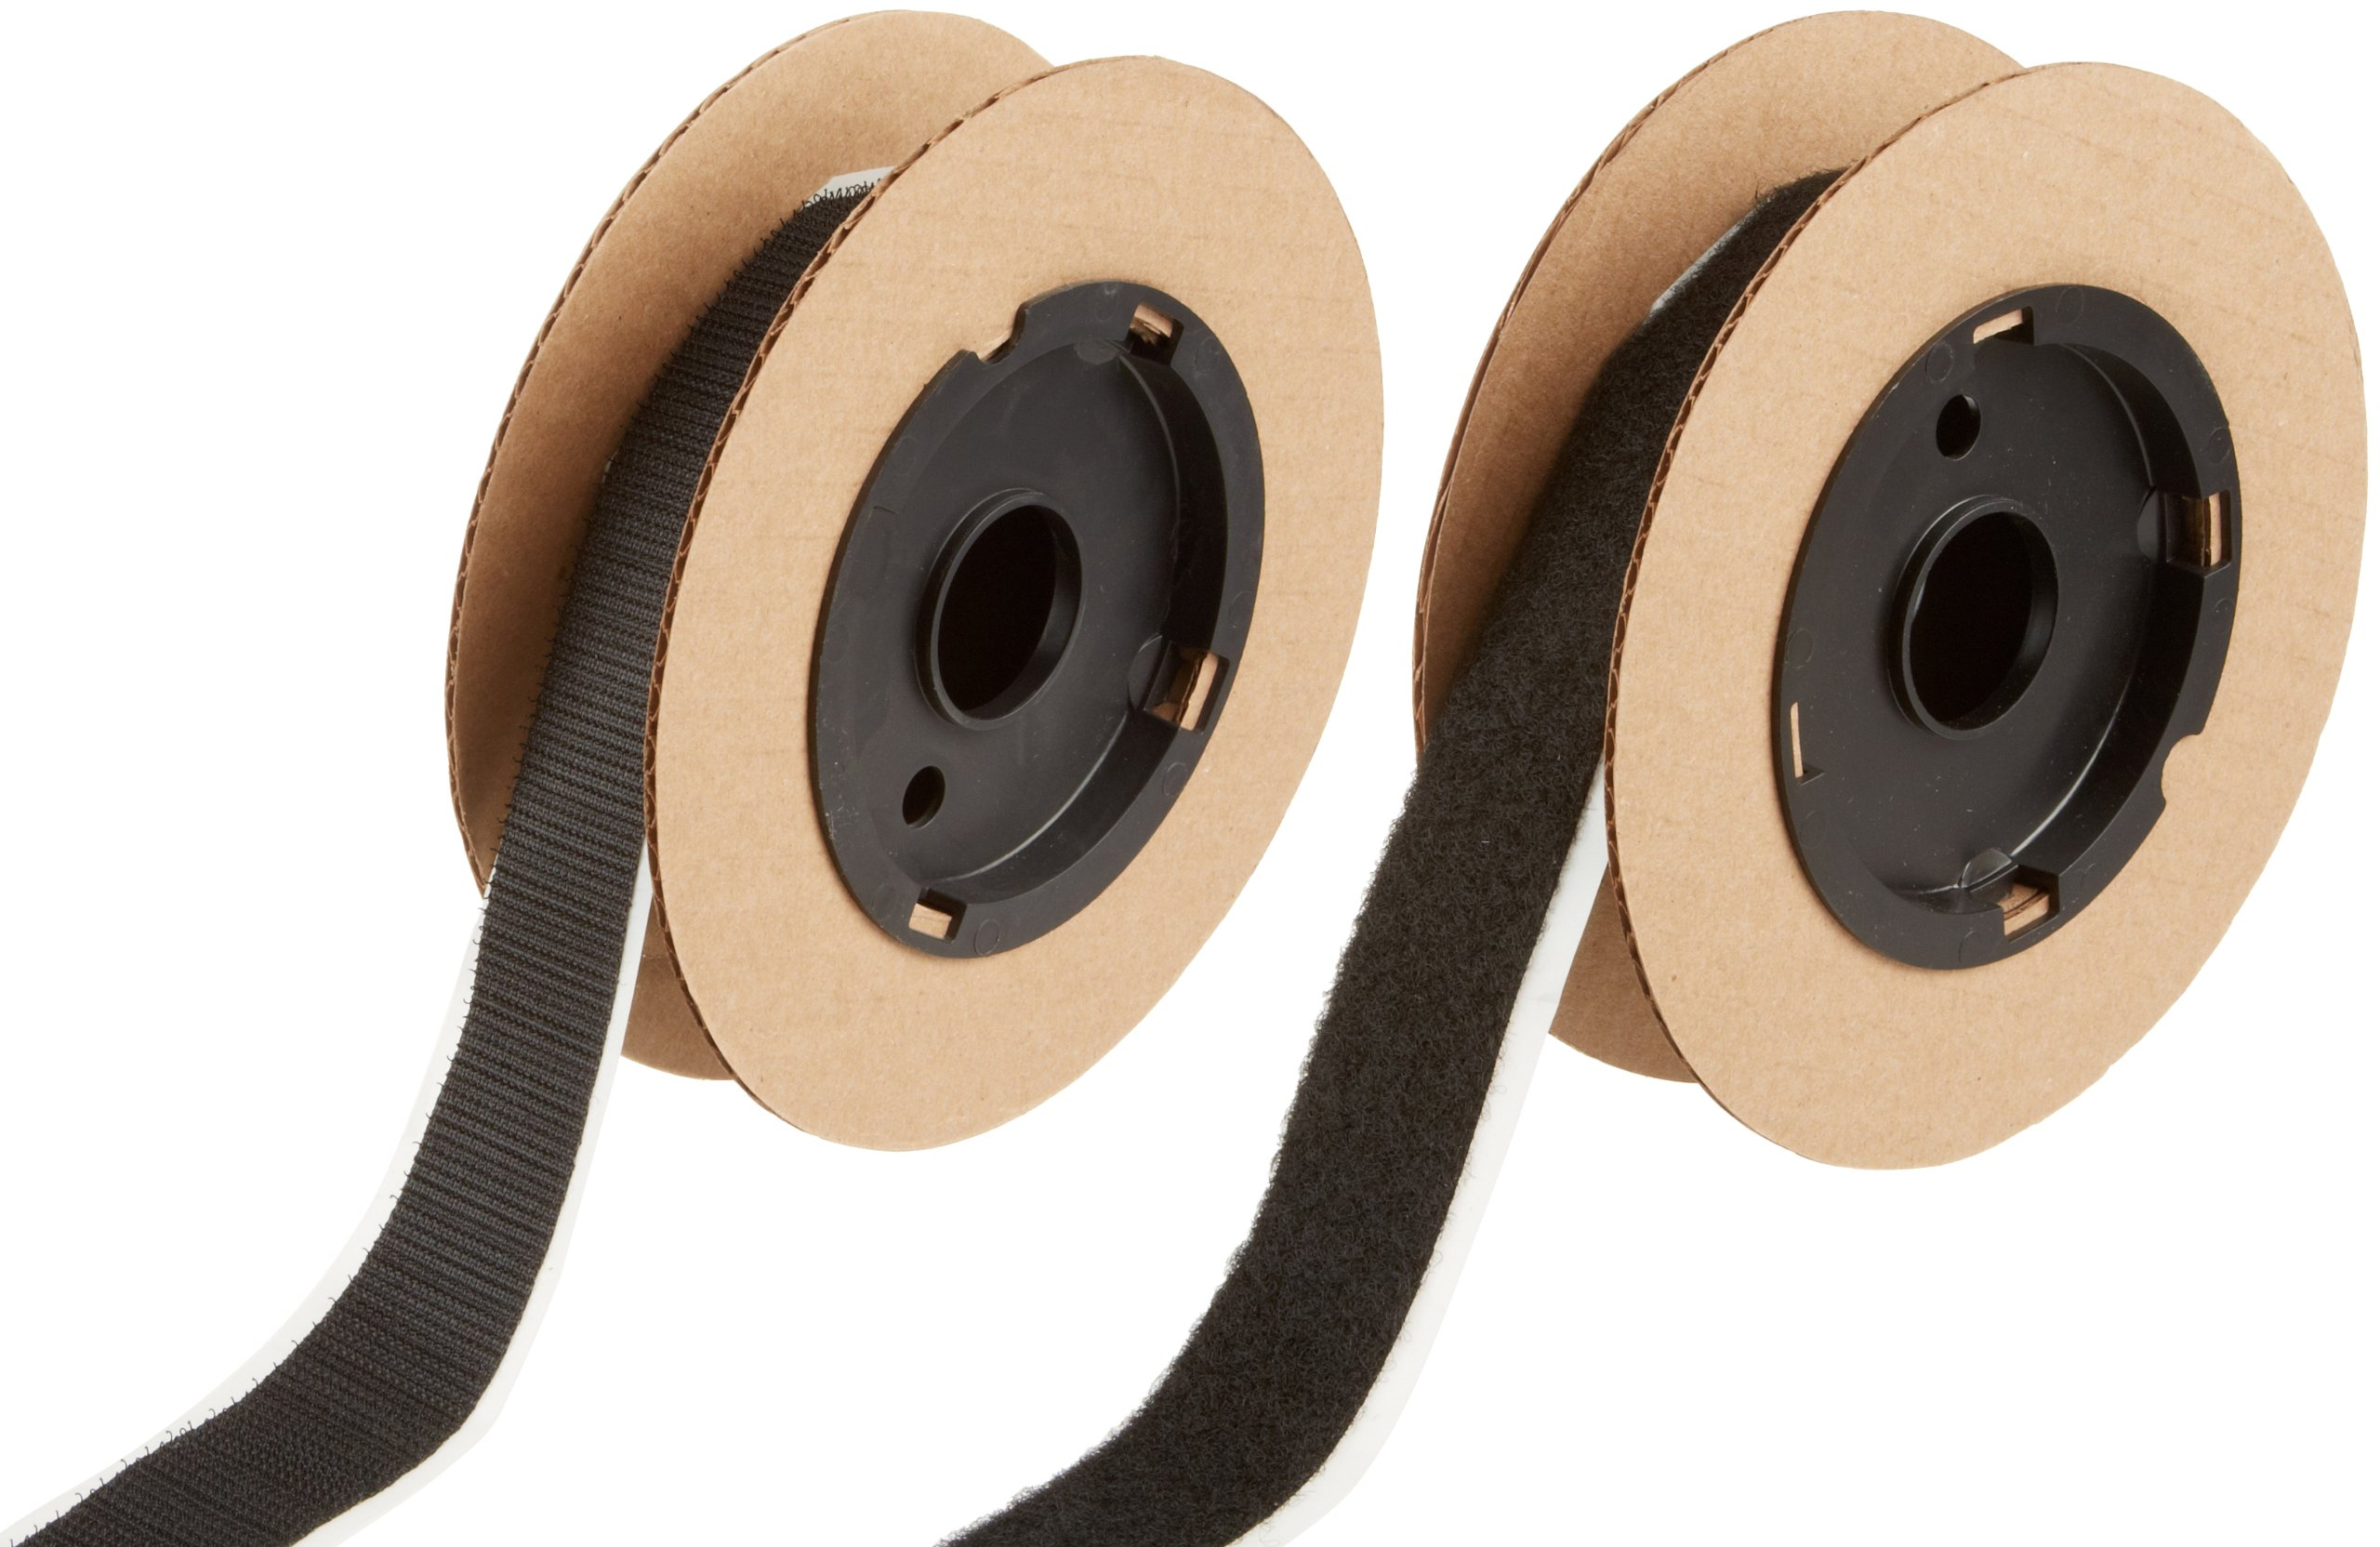 VELCRO 3804-SAT-PSA/B Black Super Adhesive Nylon Hook and Loop Combo Pack, 0132 Adhesive Backed, 1'' Wide, 5' Length